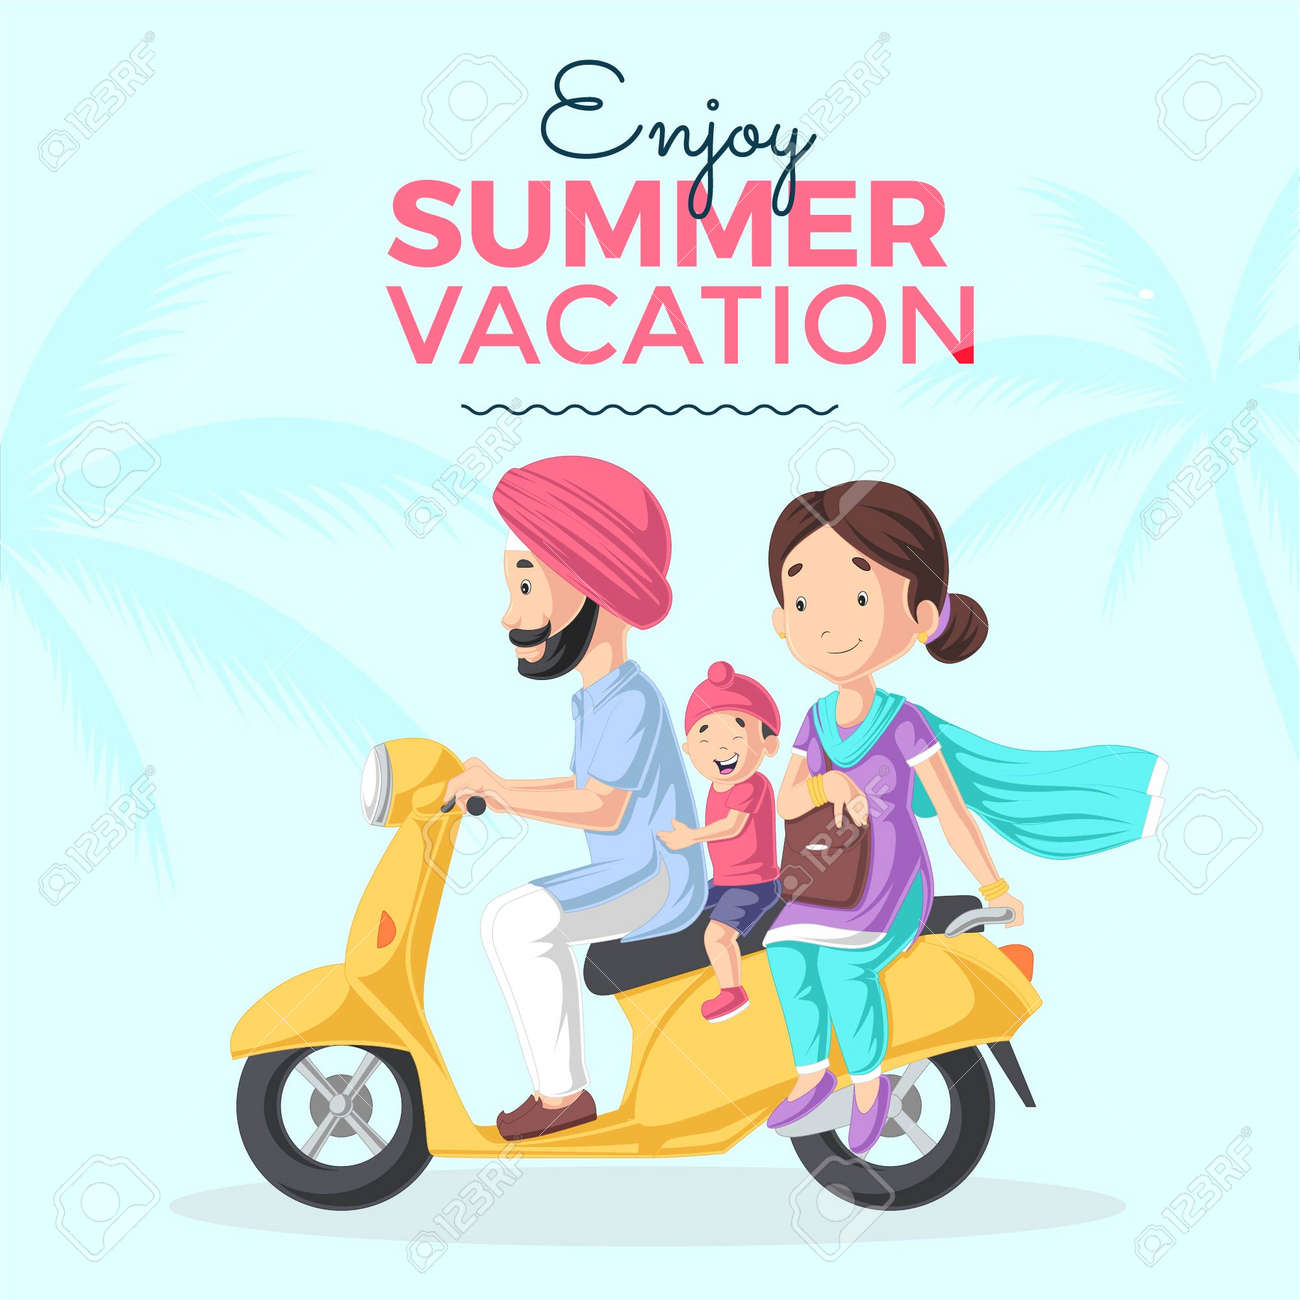 Enjoy summer vacation banner design template. Vector graphic illustration. - 171727314